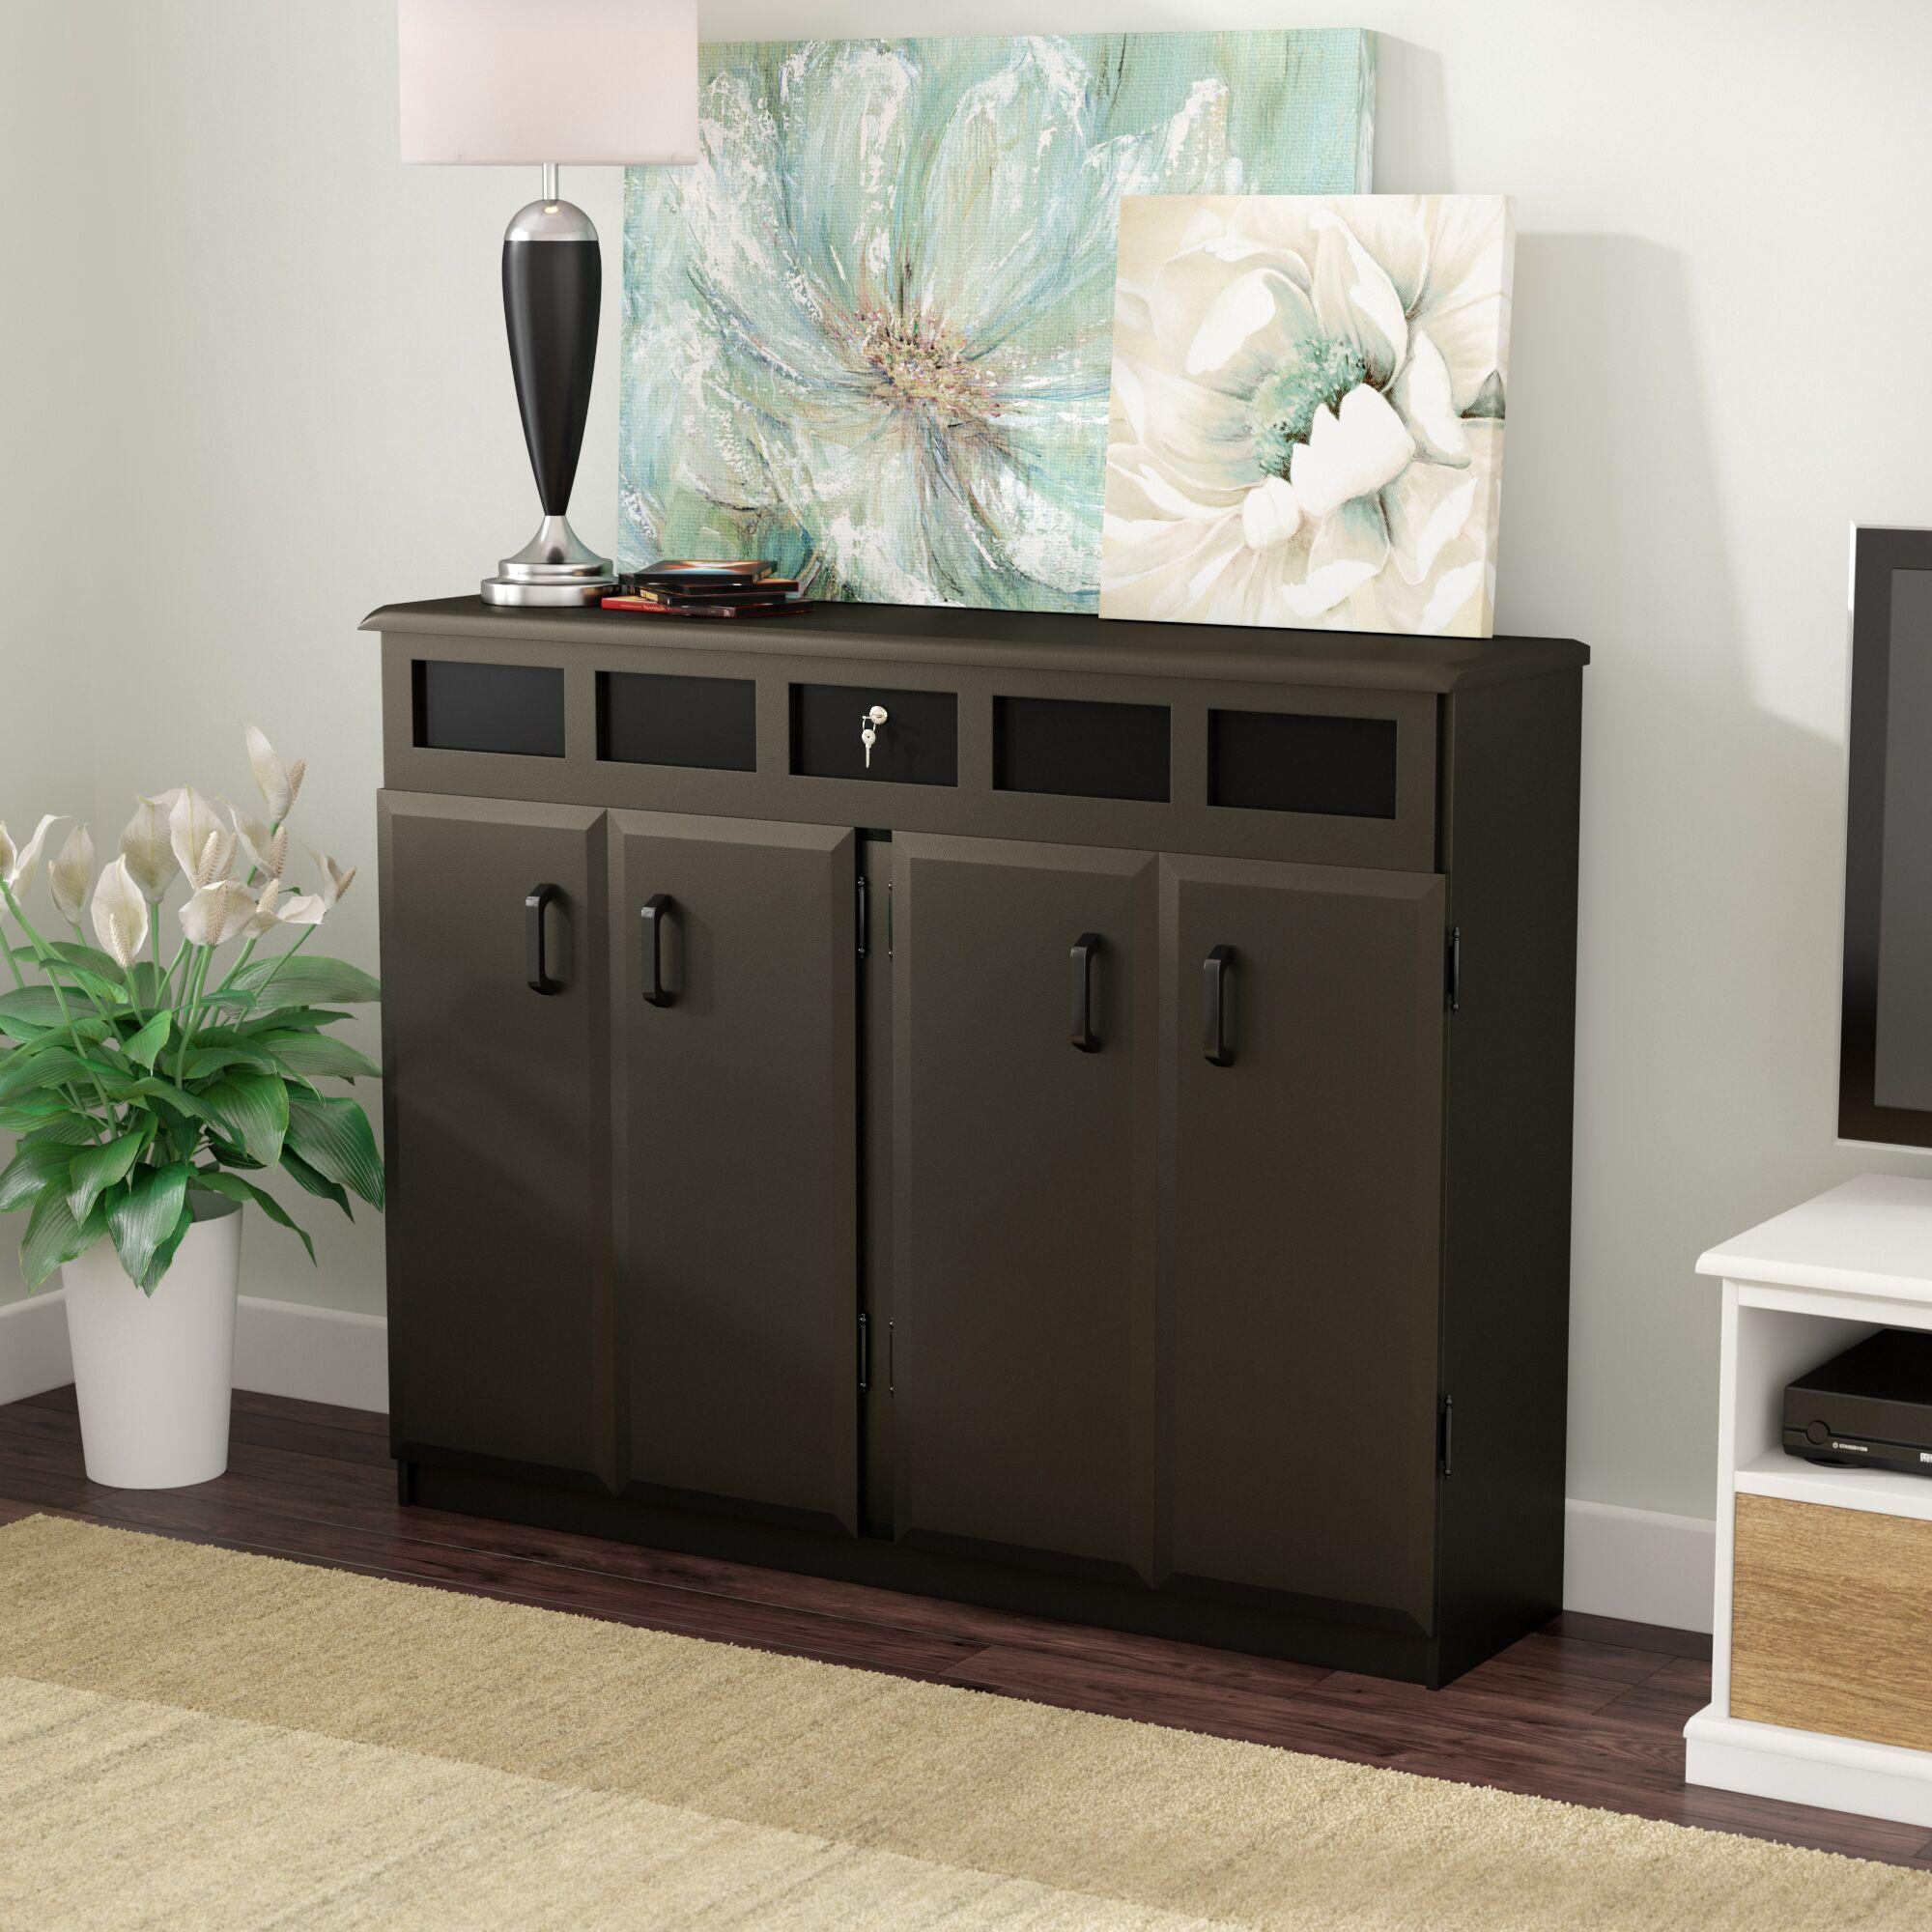 Top Load Multimedia Cabinet Color: Black